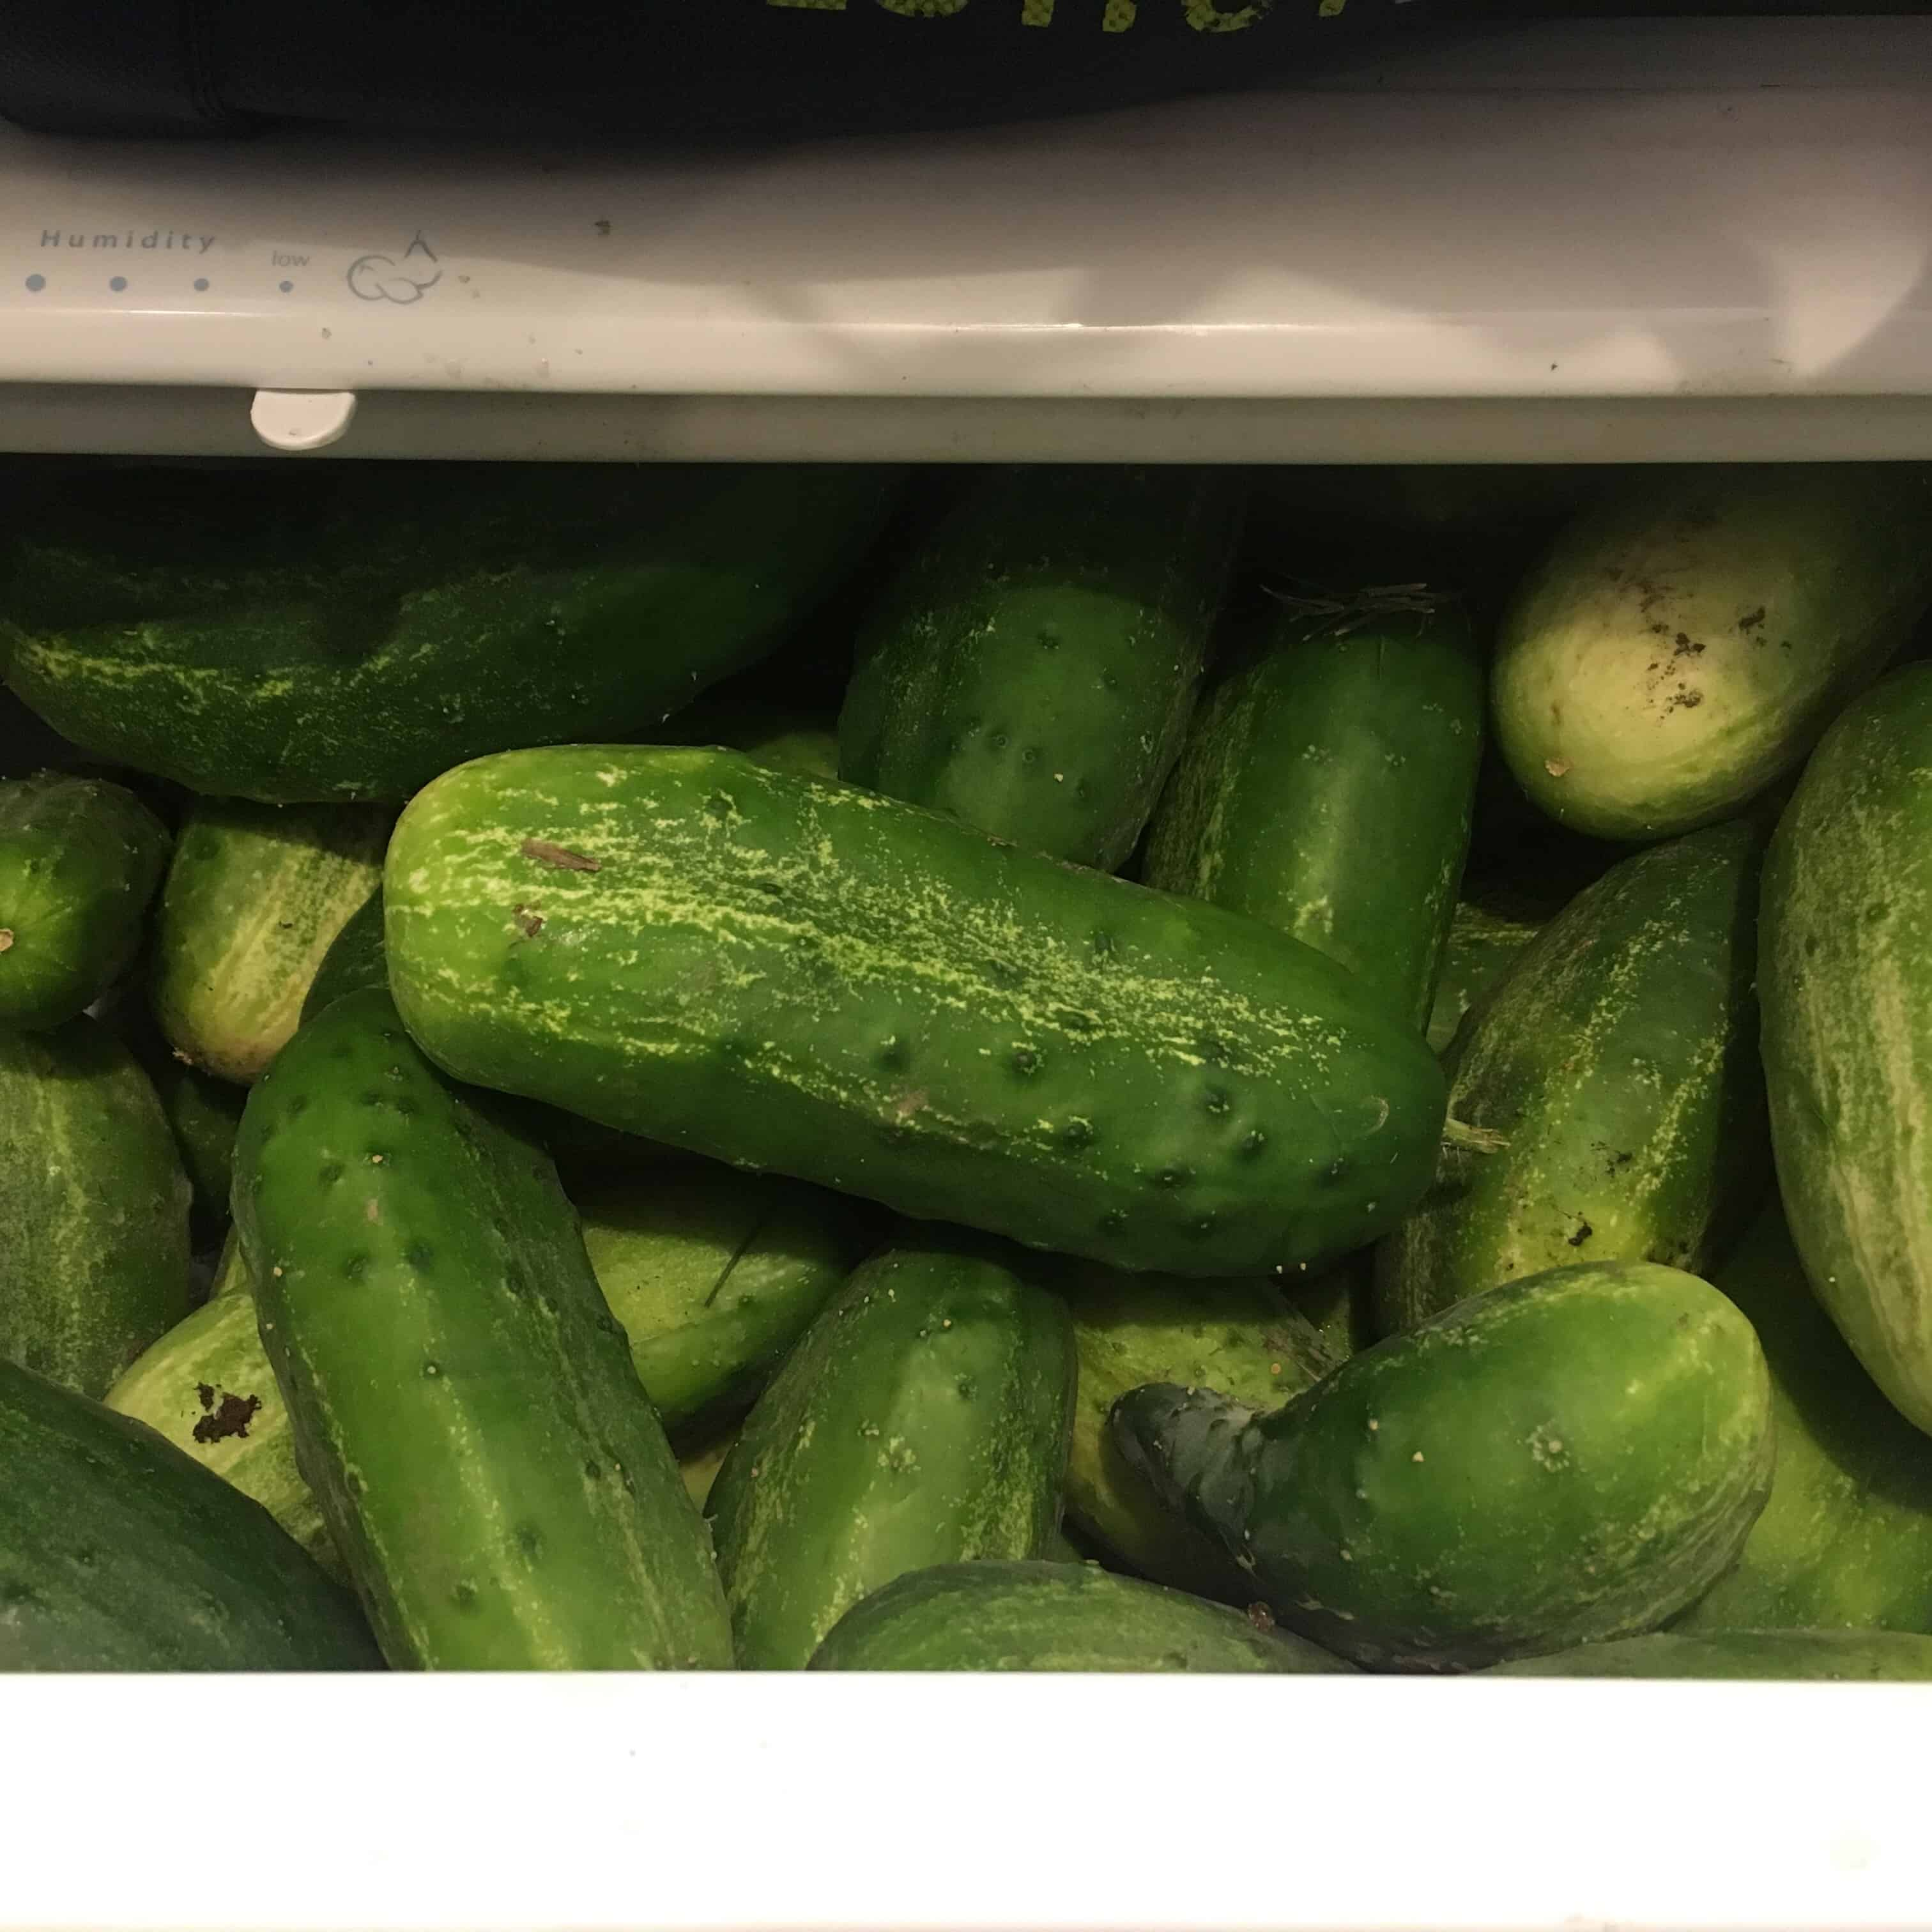 Pickling cukes in refrigerator crisper drawer. https://trimazing.com